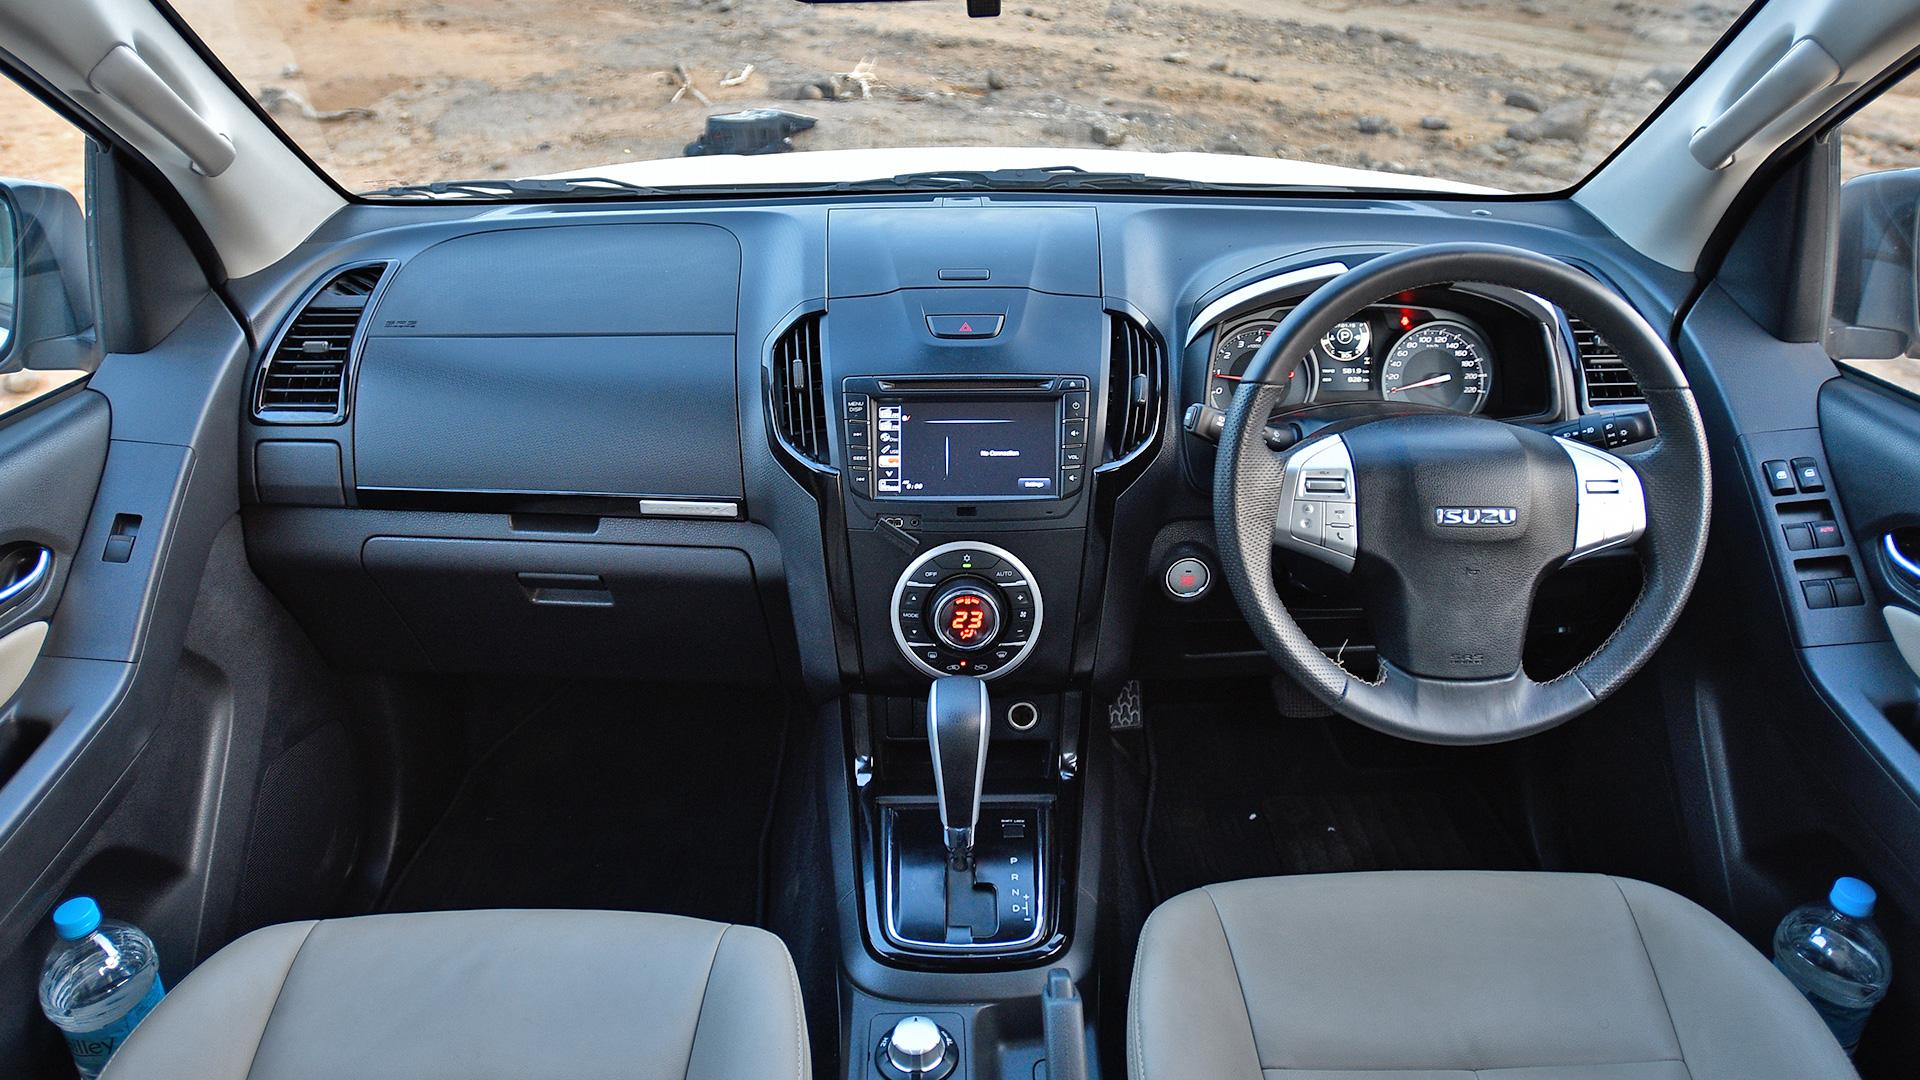 Isuzu MU-X 2017 4x4 Interior Car Photos - Overdrive